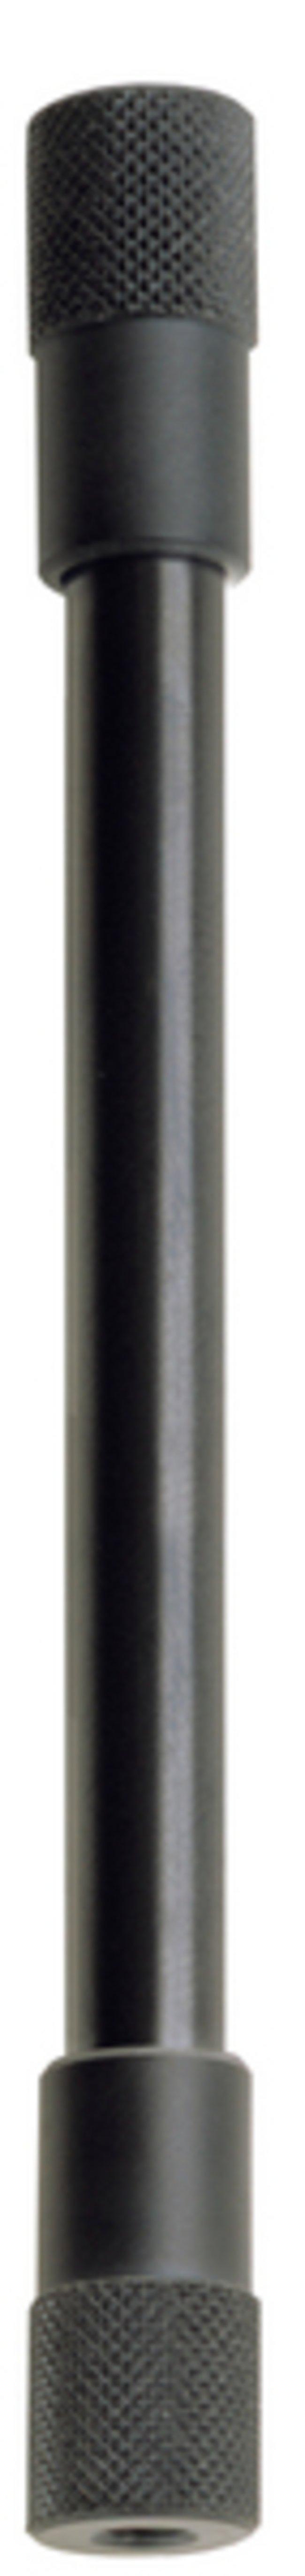 MilliporeSigma™Chromolith™ Performance RP-18 Endcapped HPLC Columns